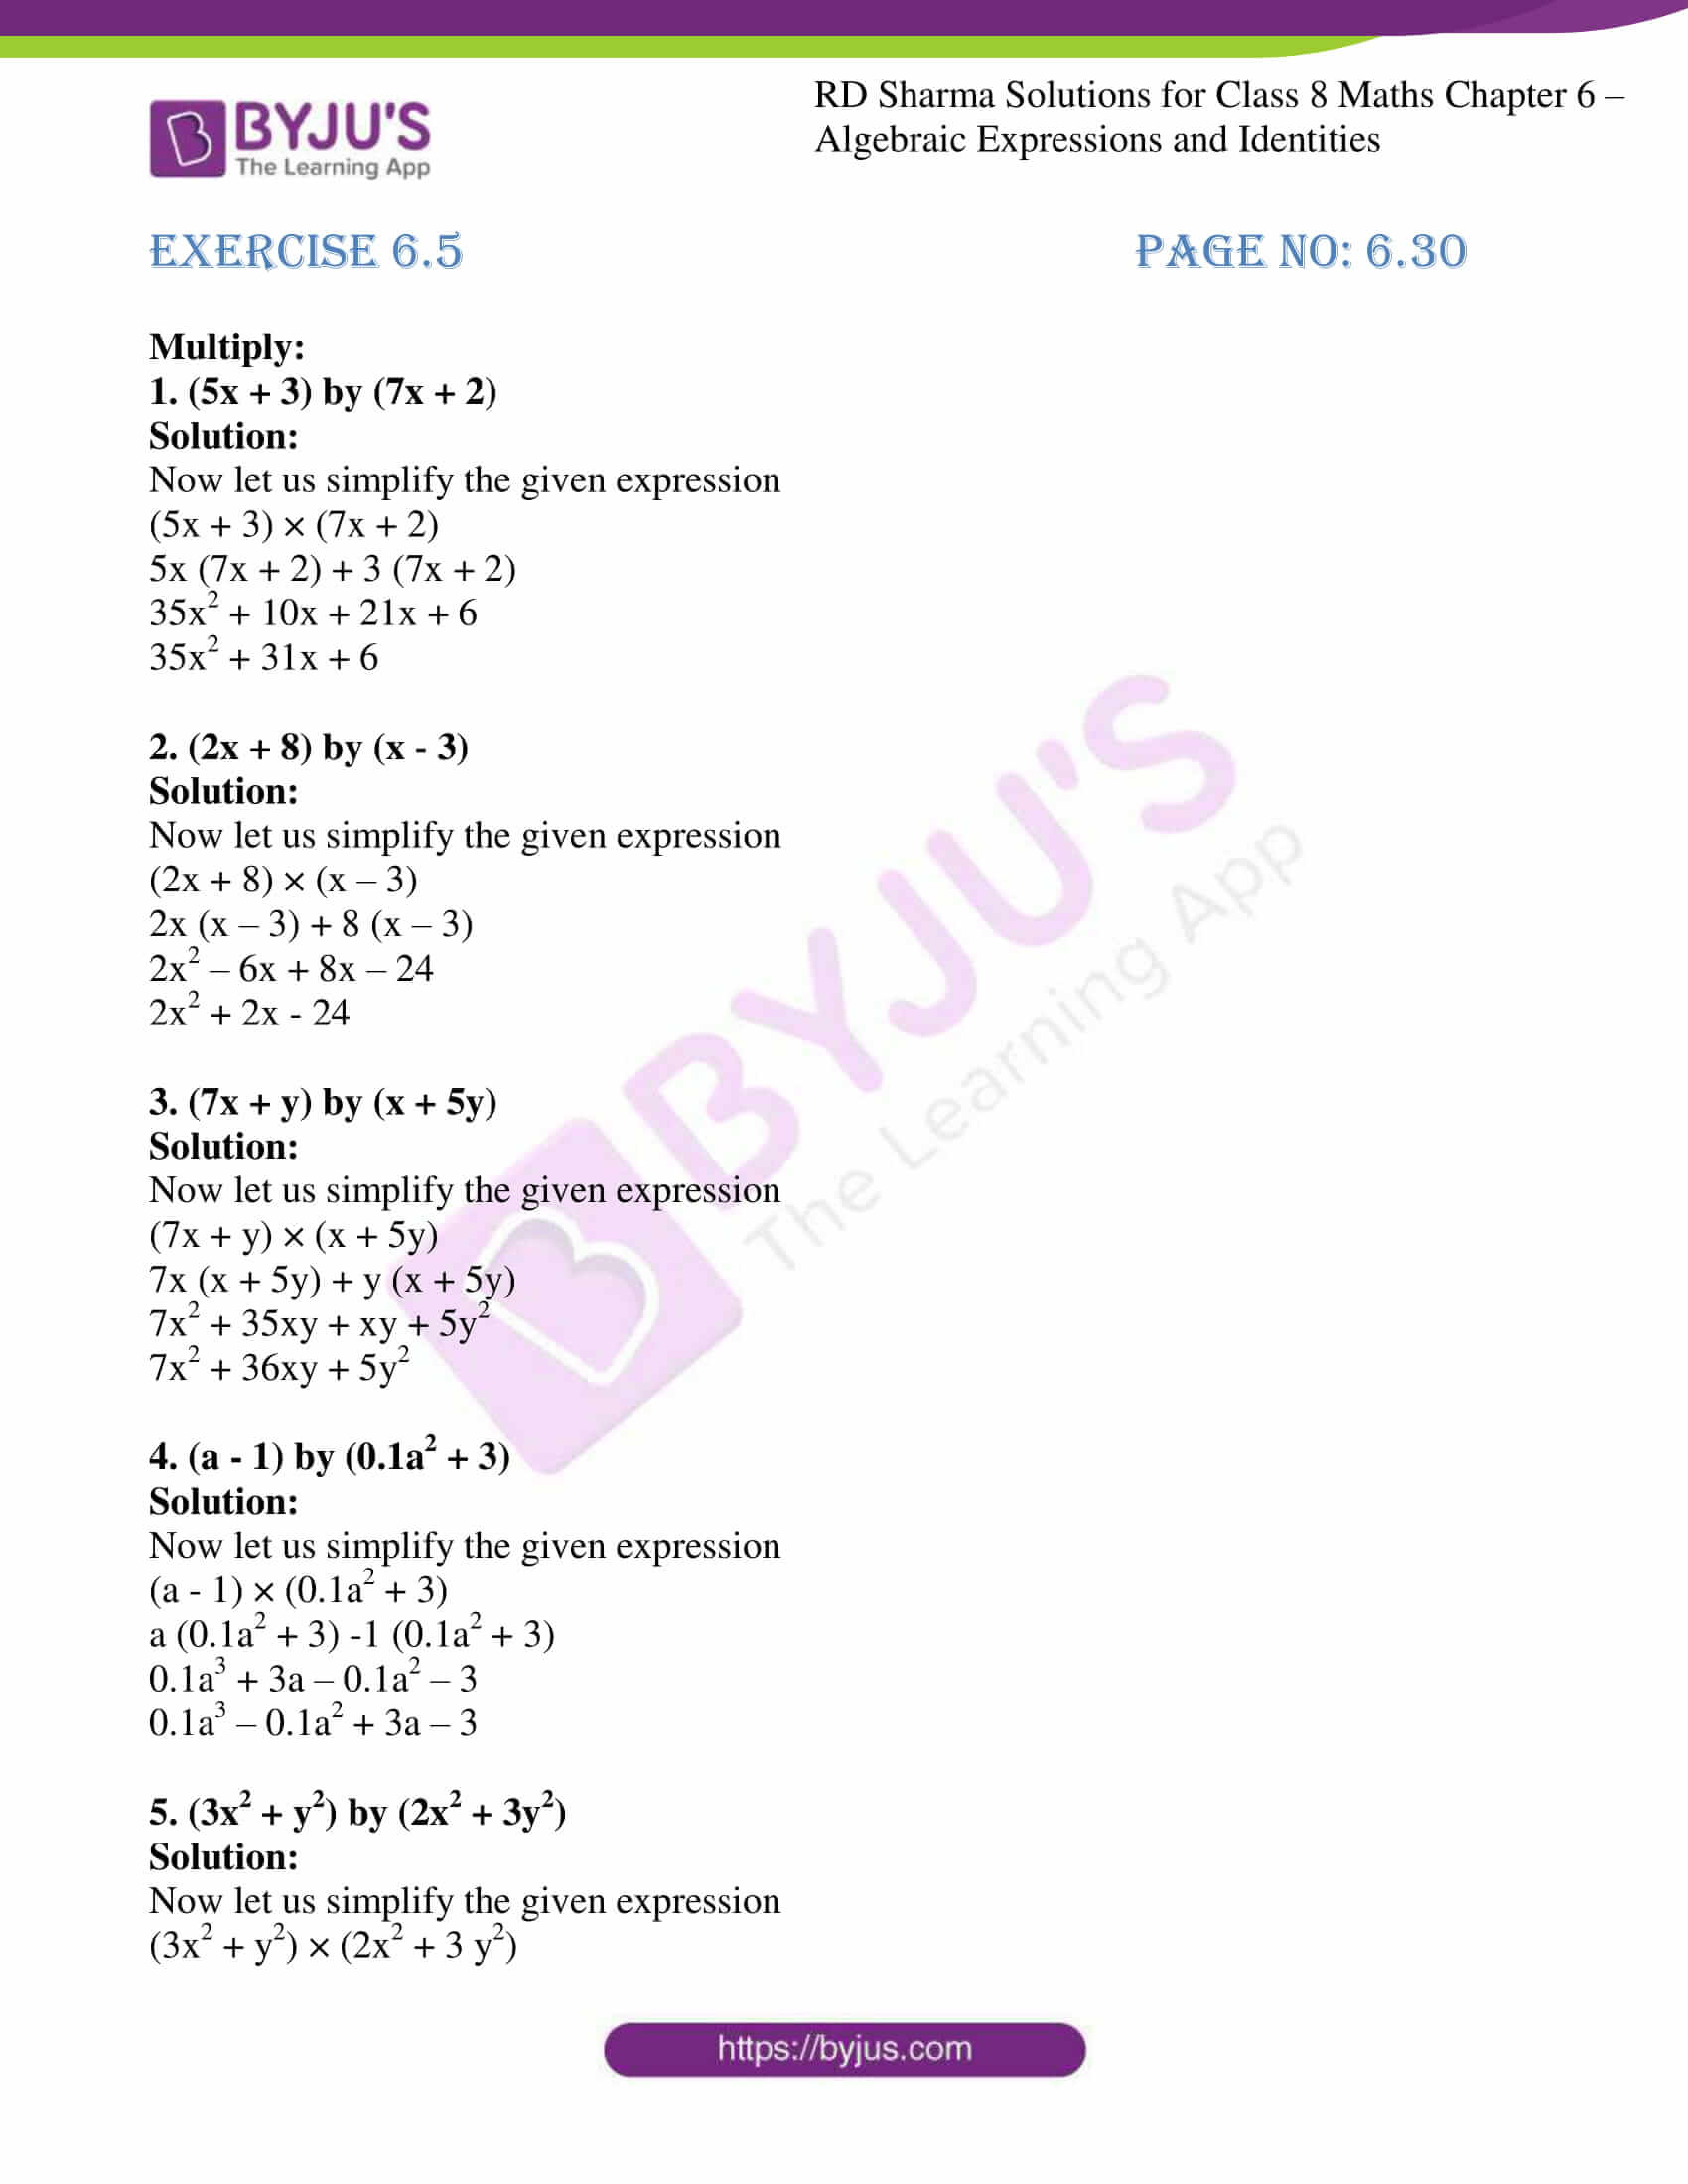 rd sharma class 8 maths chapter 6 exercise 5 1